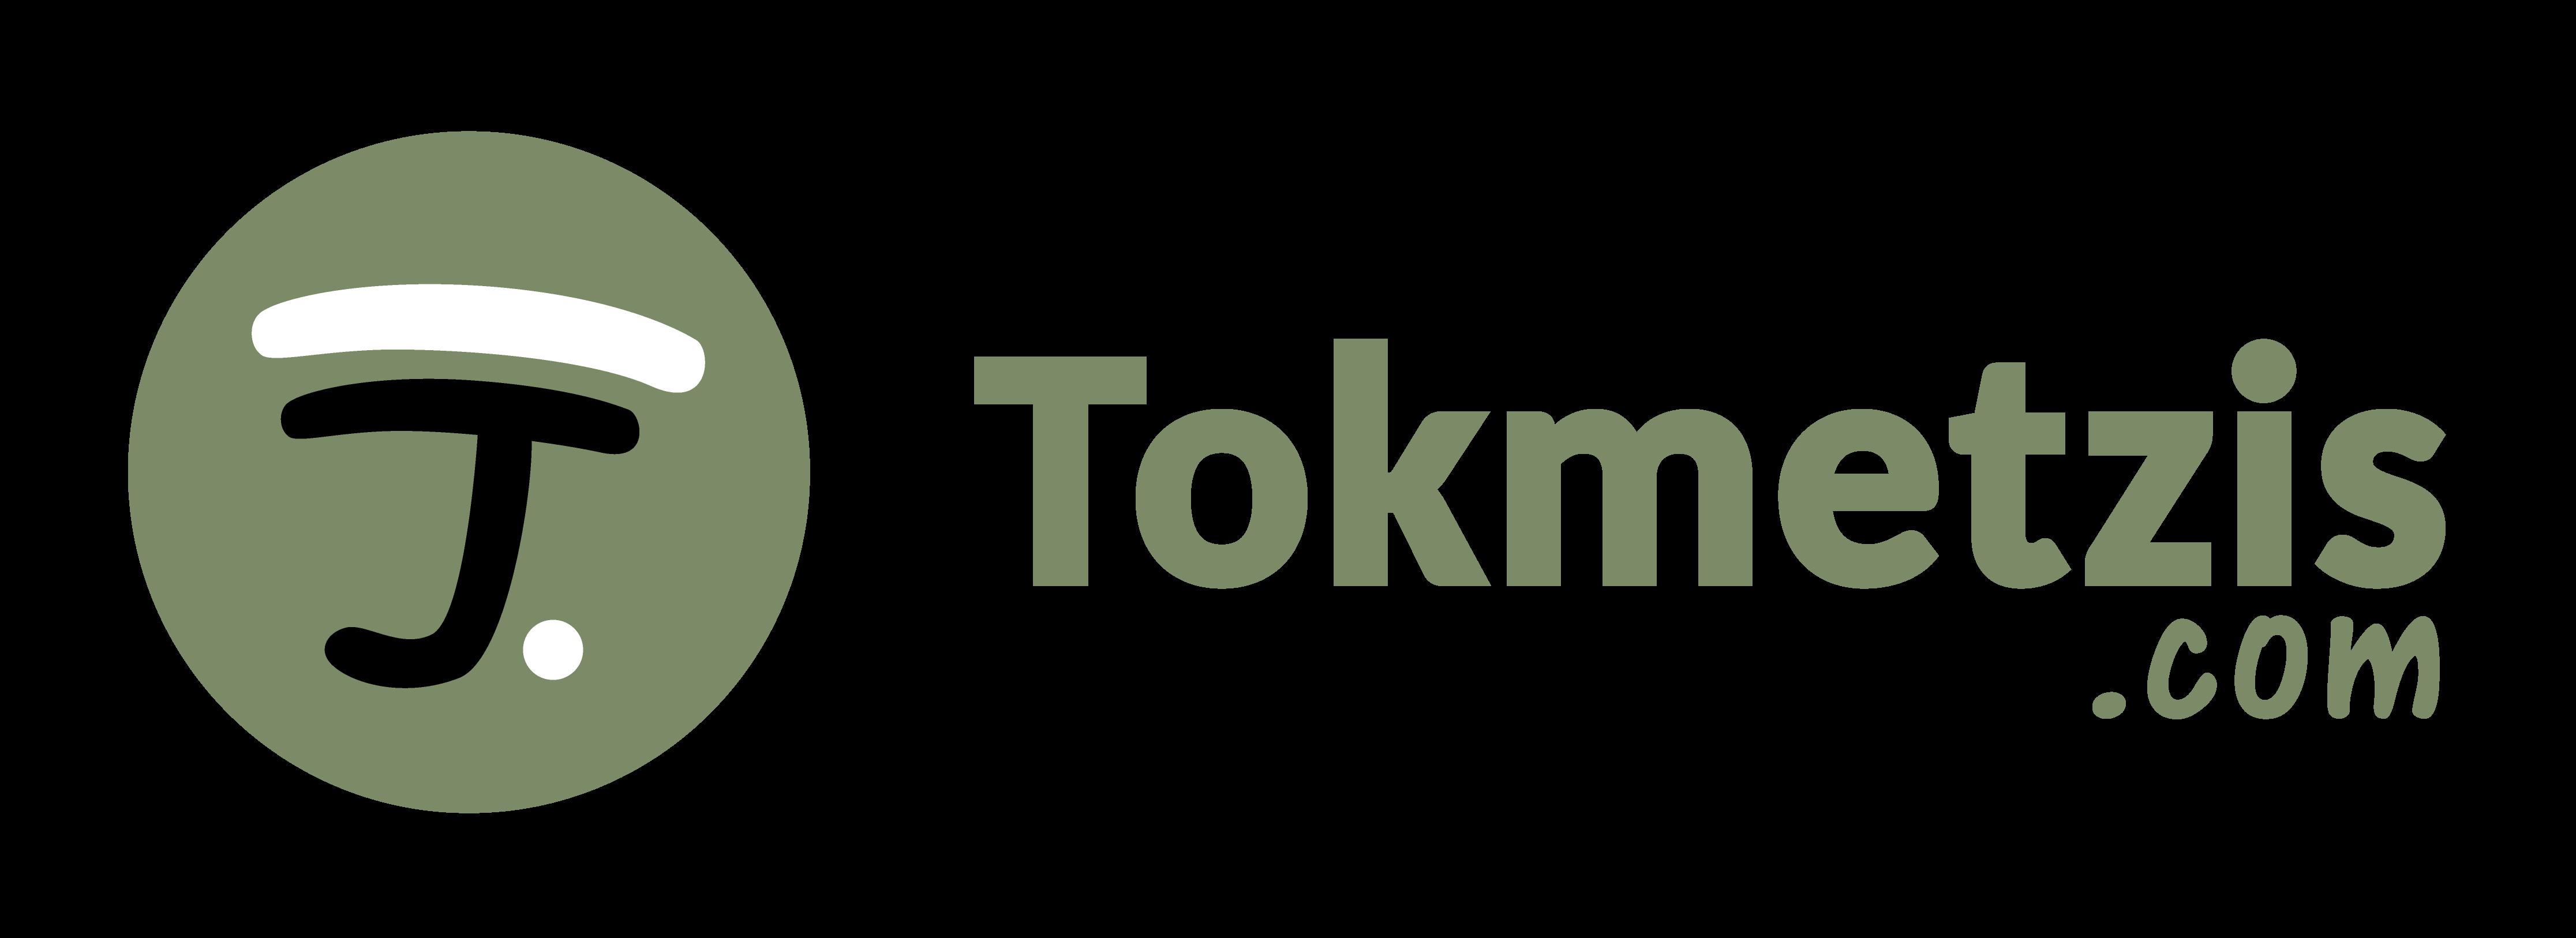 Tokmetzis.com Logo 2020 – RGB FullColor Negatief – breed-01